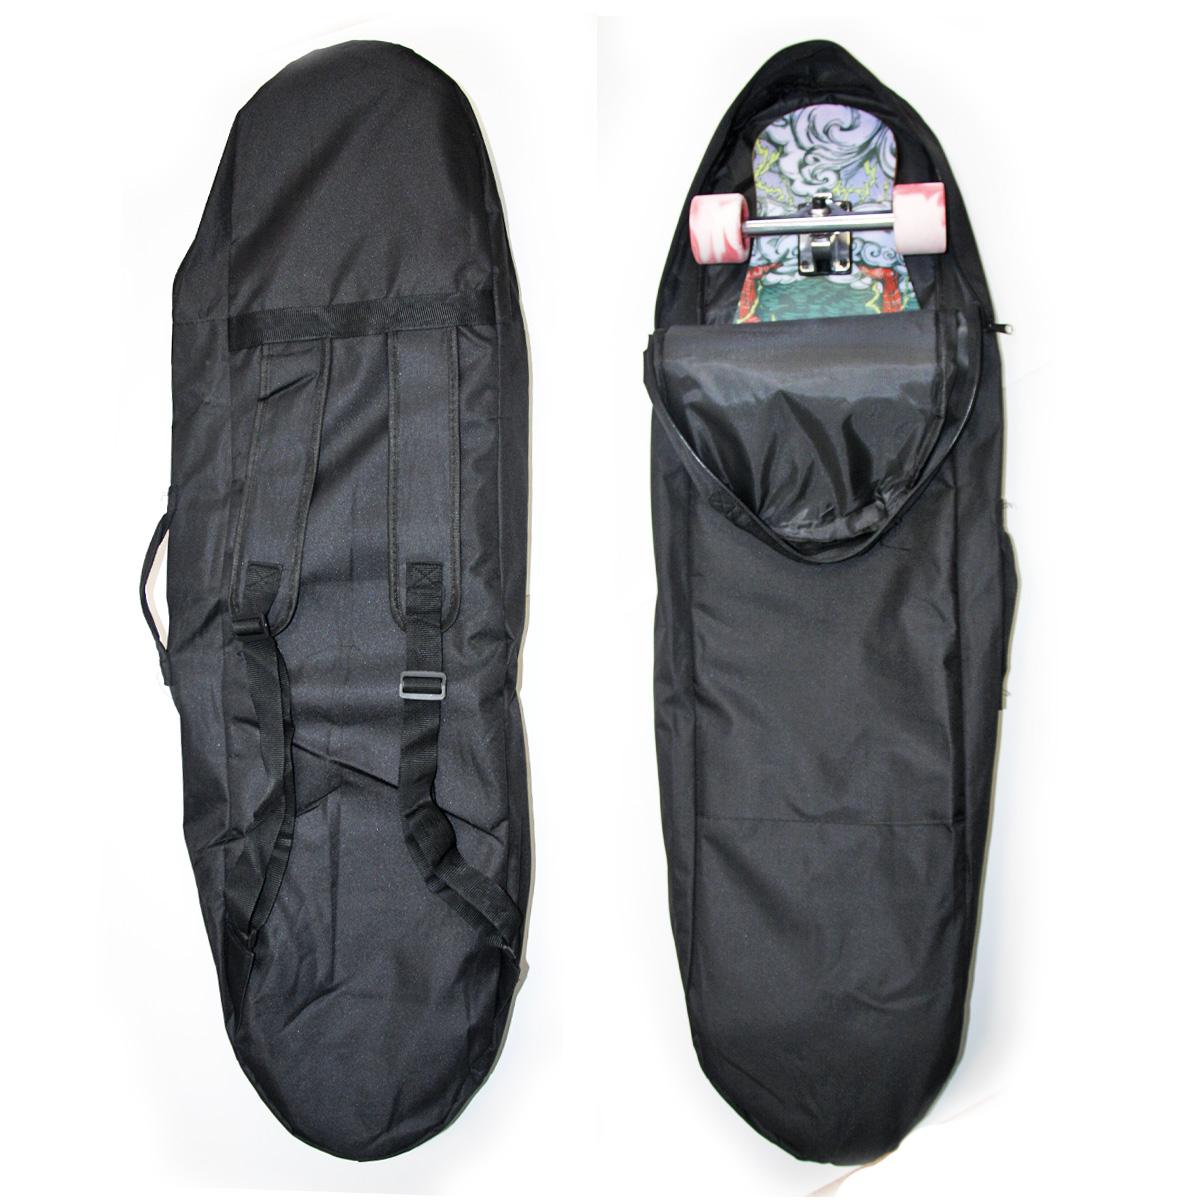 Сумка-Рюкзак для лонгборда 120см Black